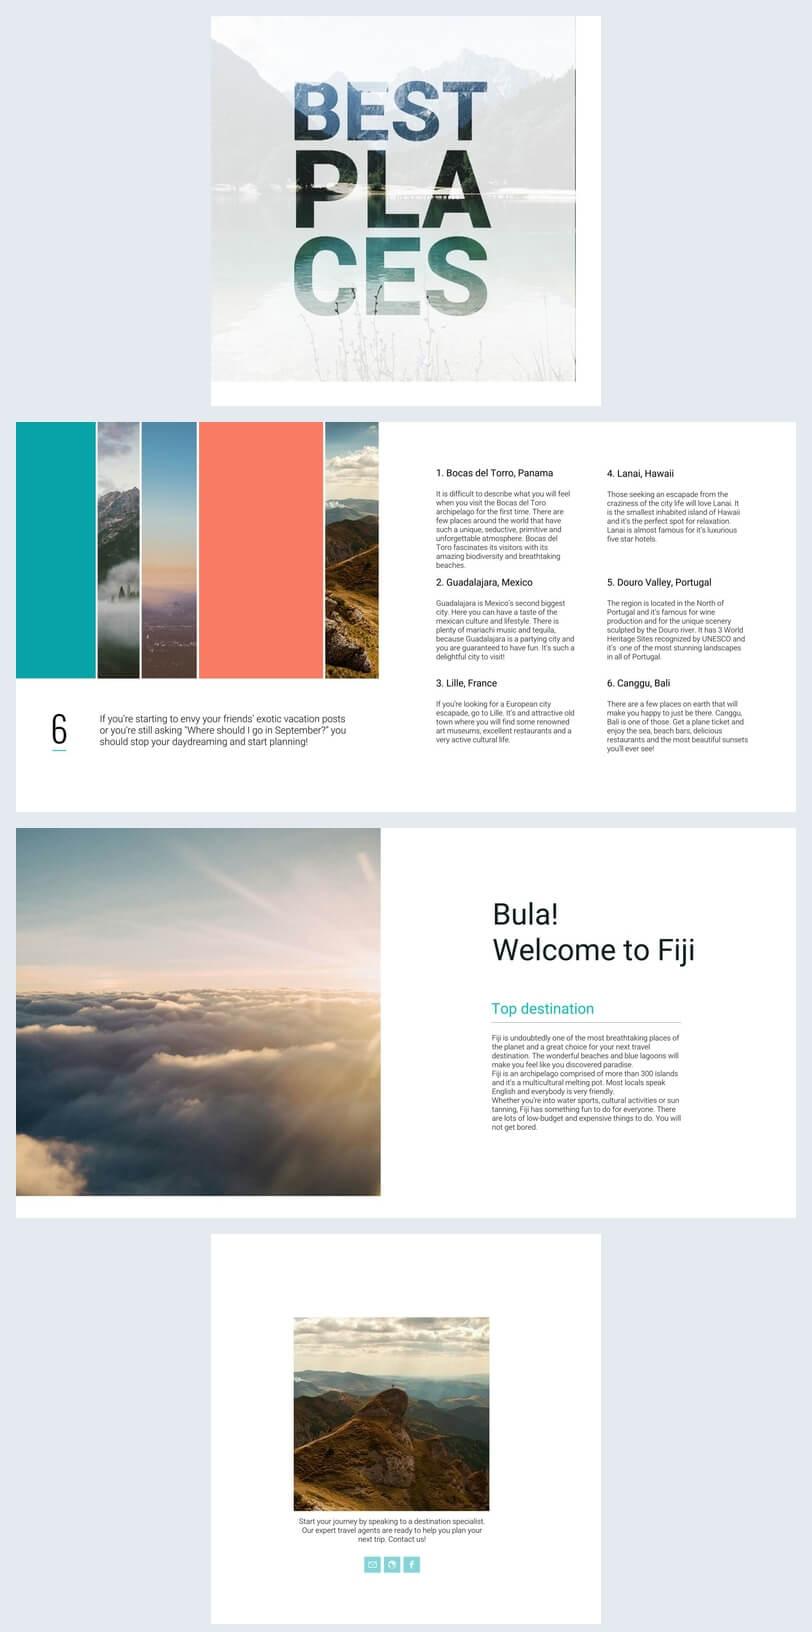 Beautiful Travel Guide Brochure Template - Flipsnack Inside Travel Guide Brochure Template